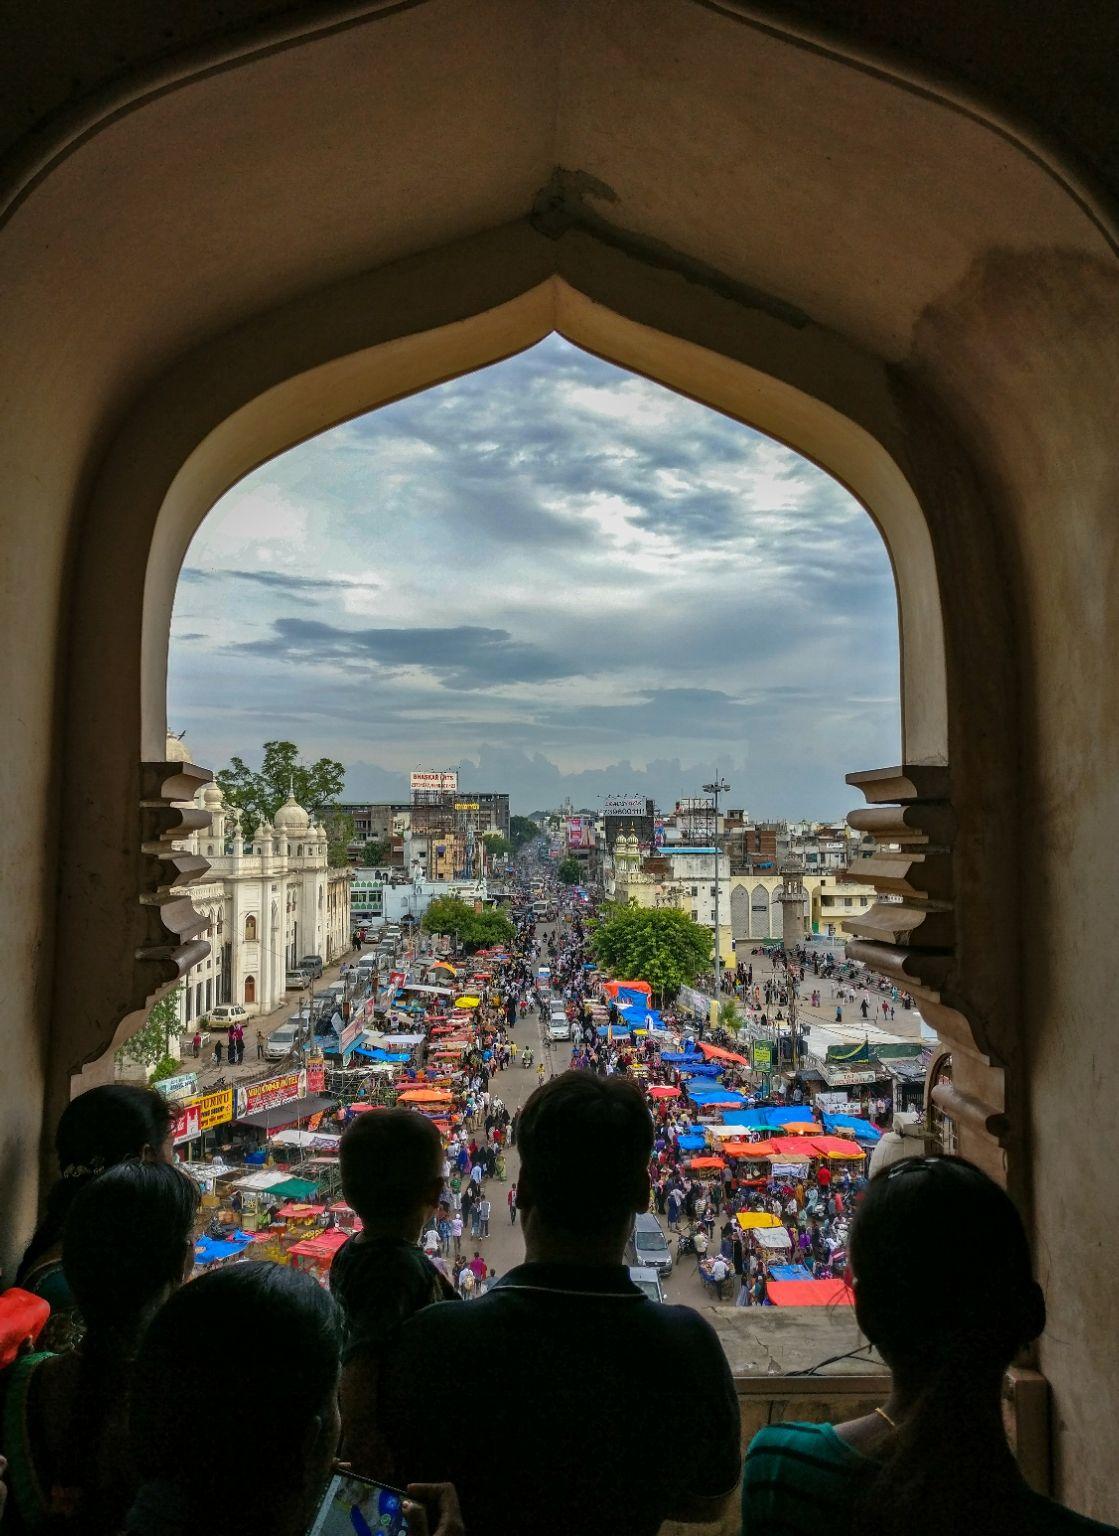 Photo of Charminar (Old City) By soham acharya